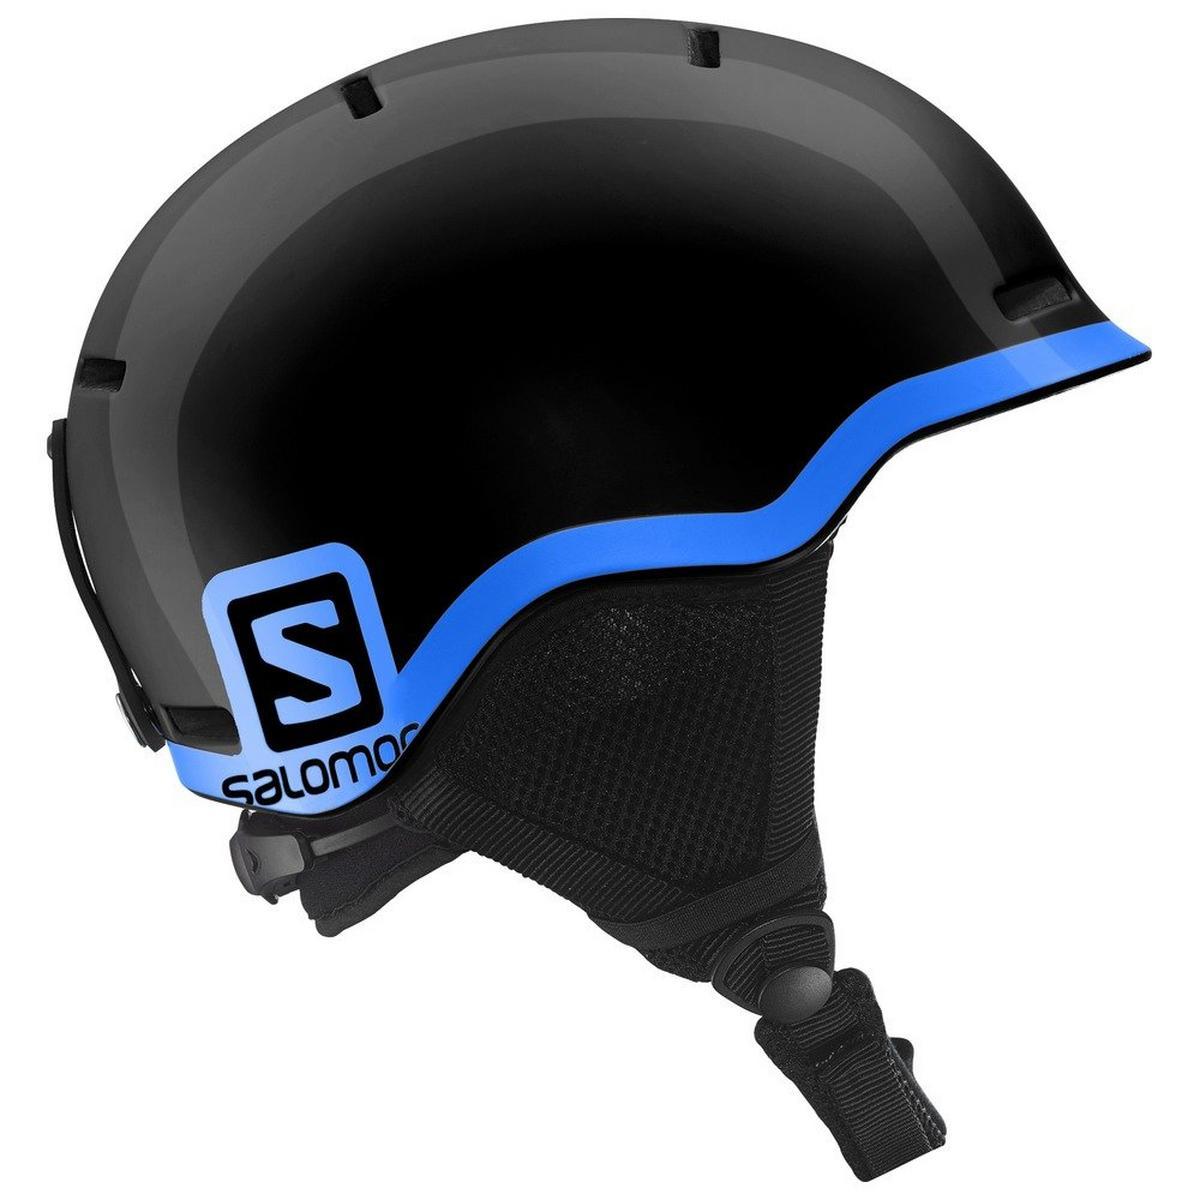 Salomon Kid's Grom Helmet